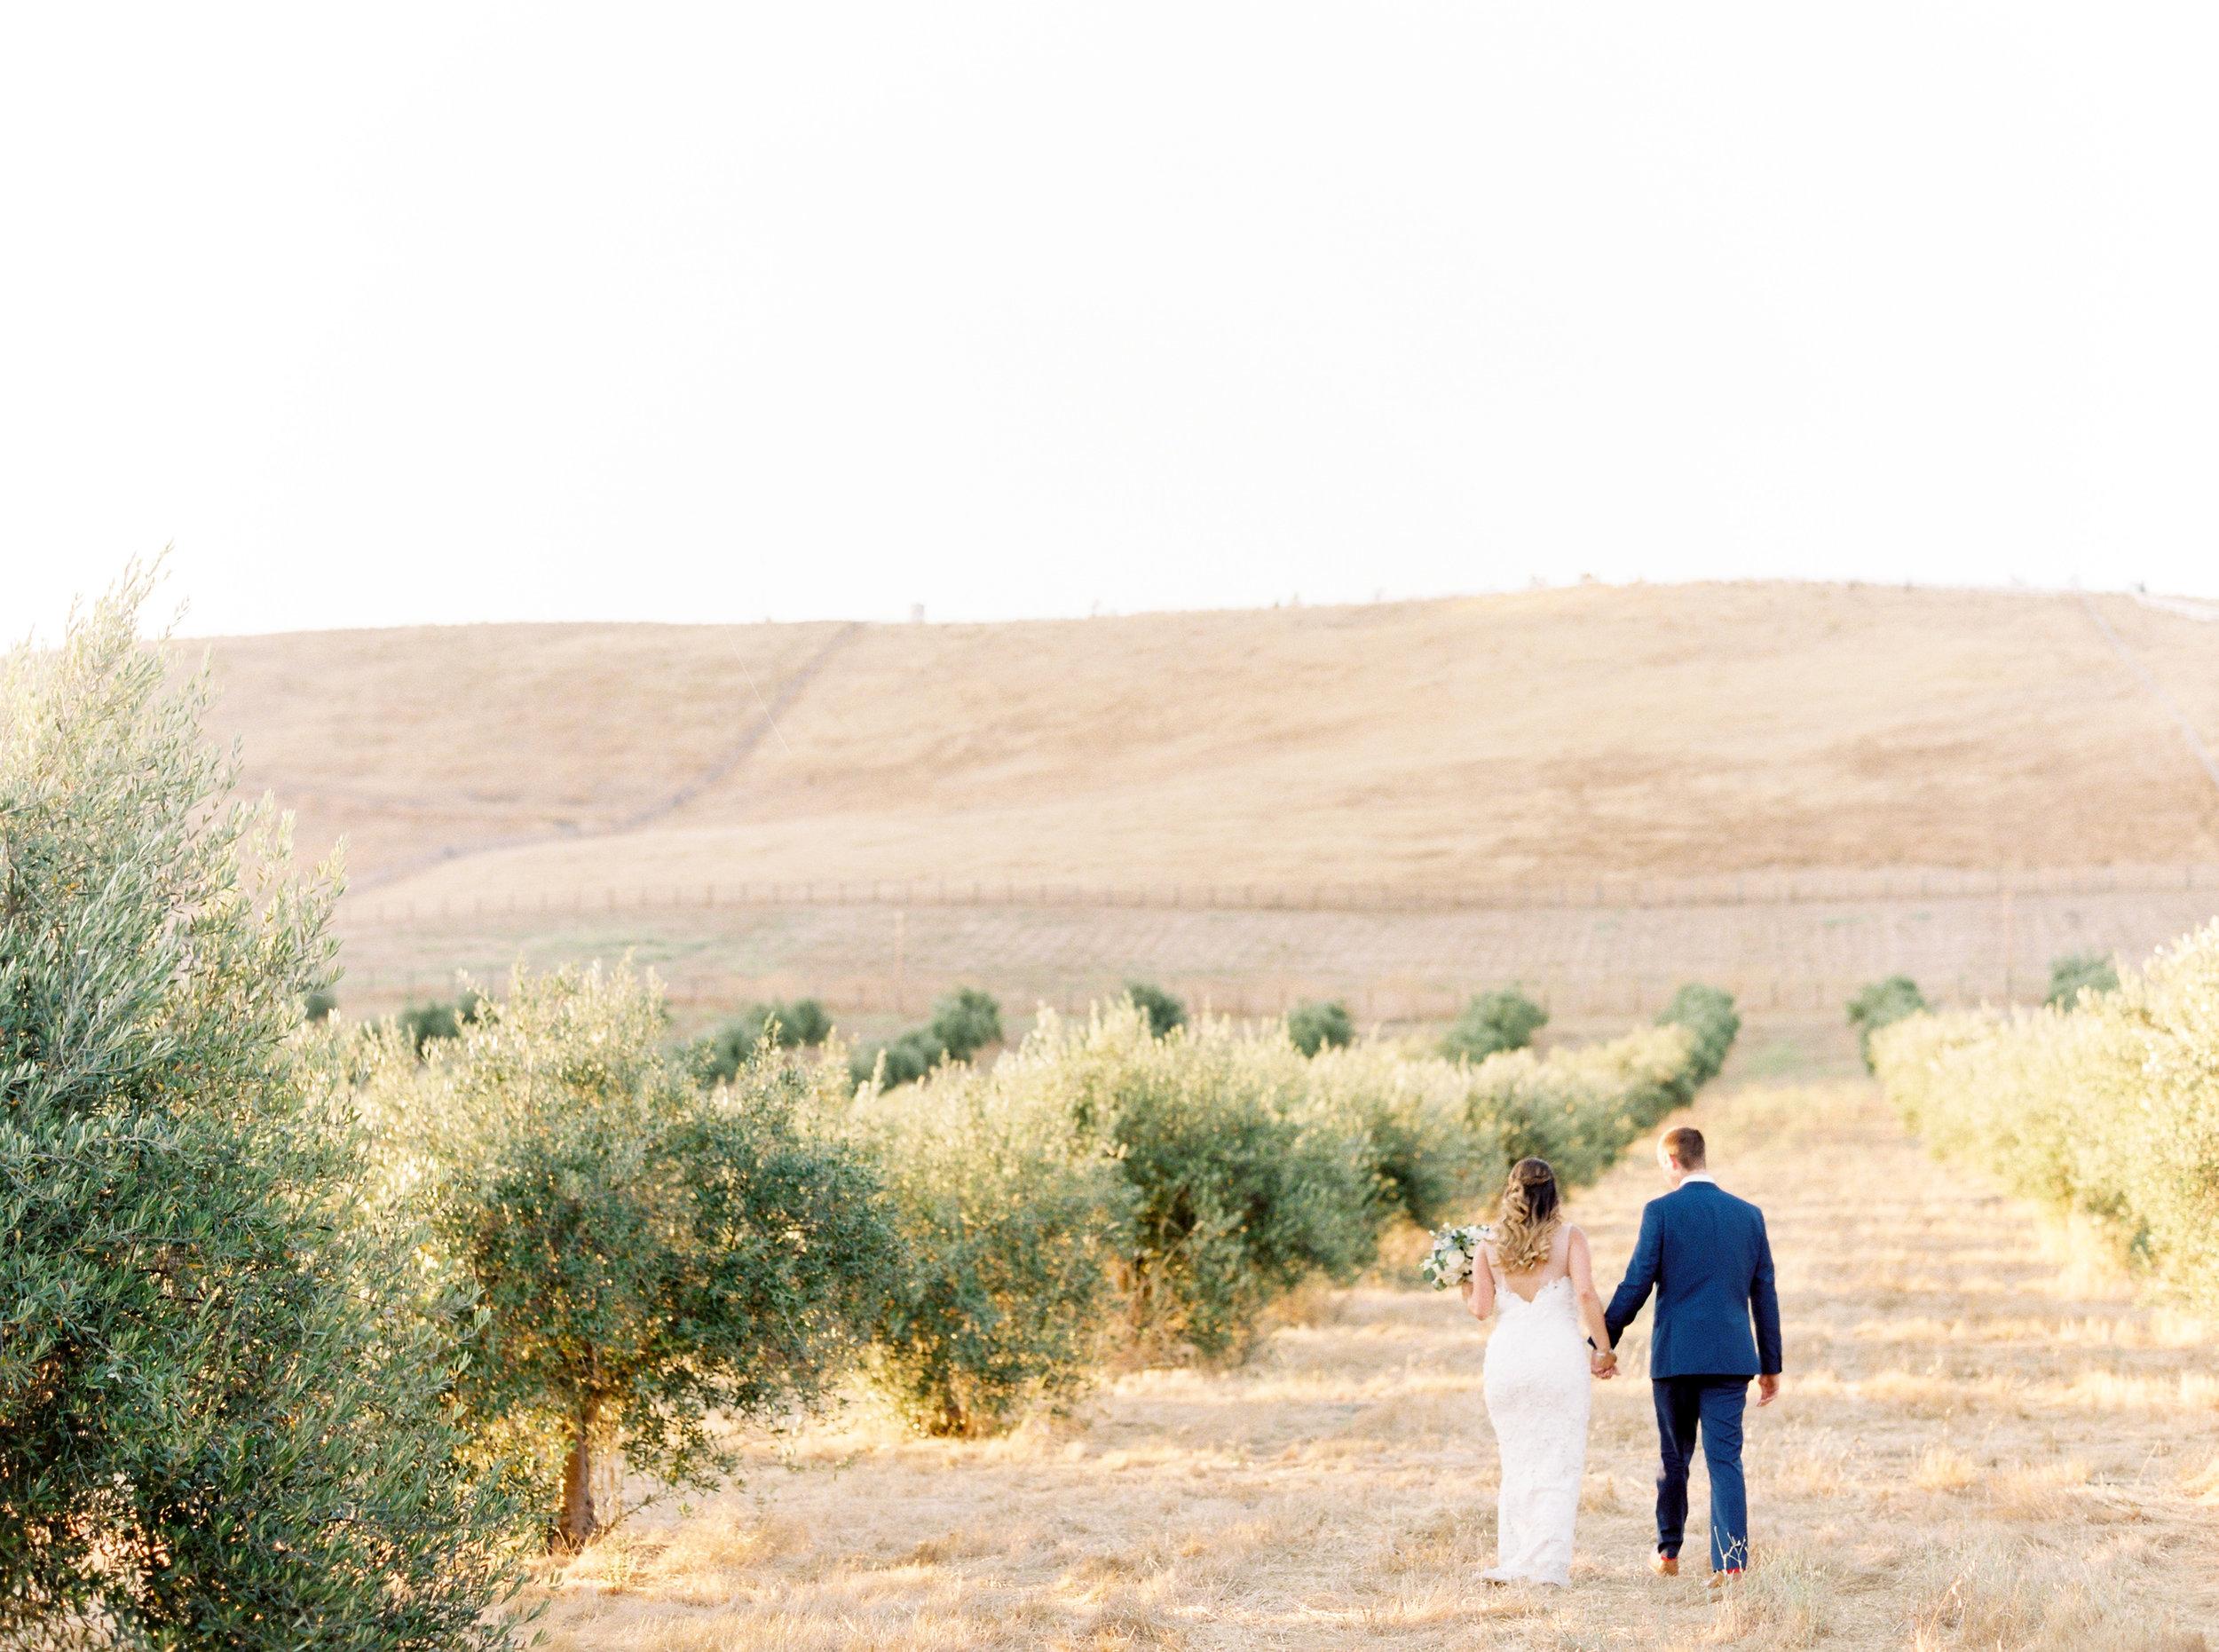 the-purple-orchid-resort-wedding-in-livermore-california-128.jpg